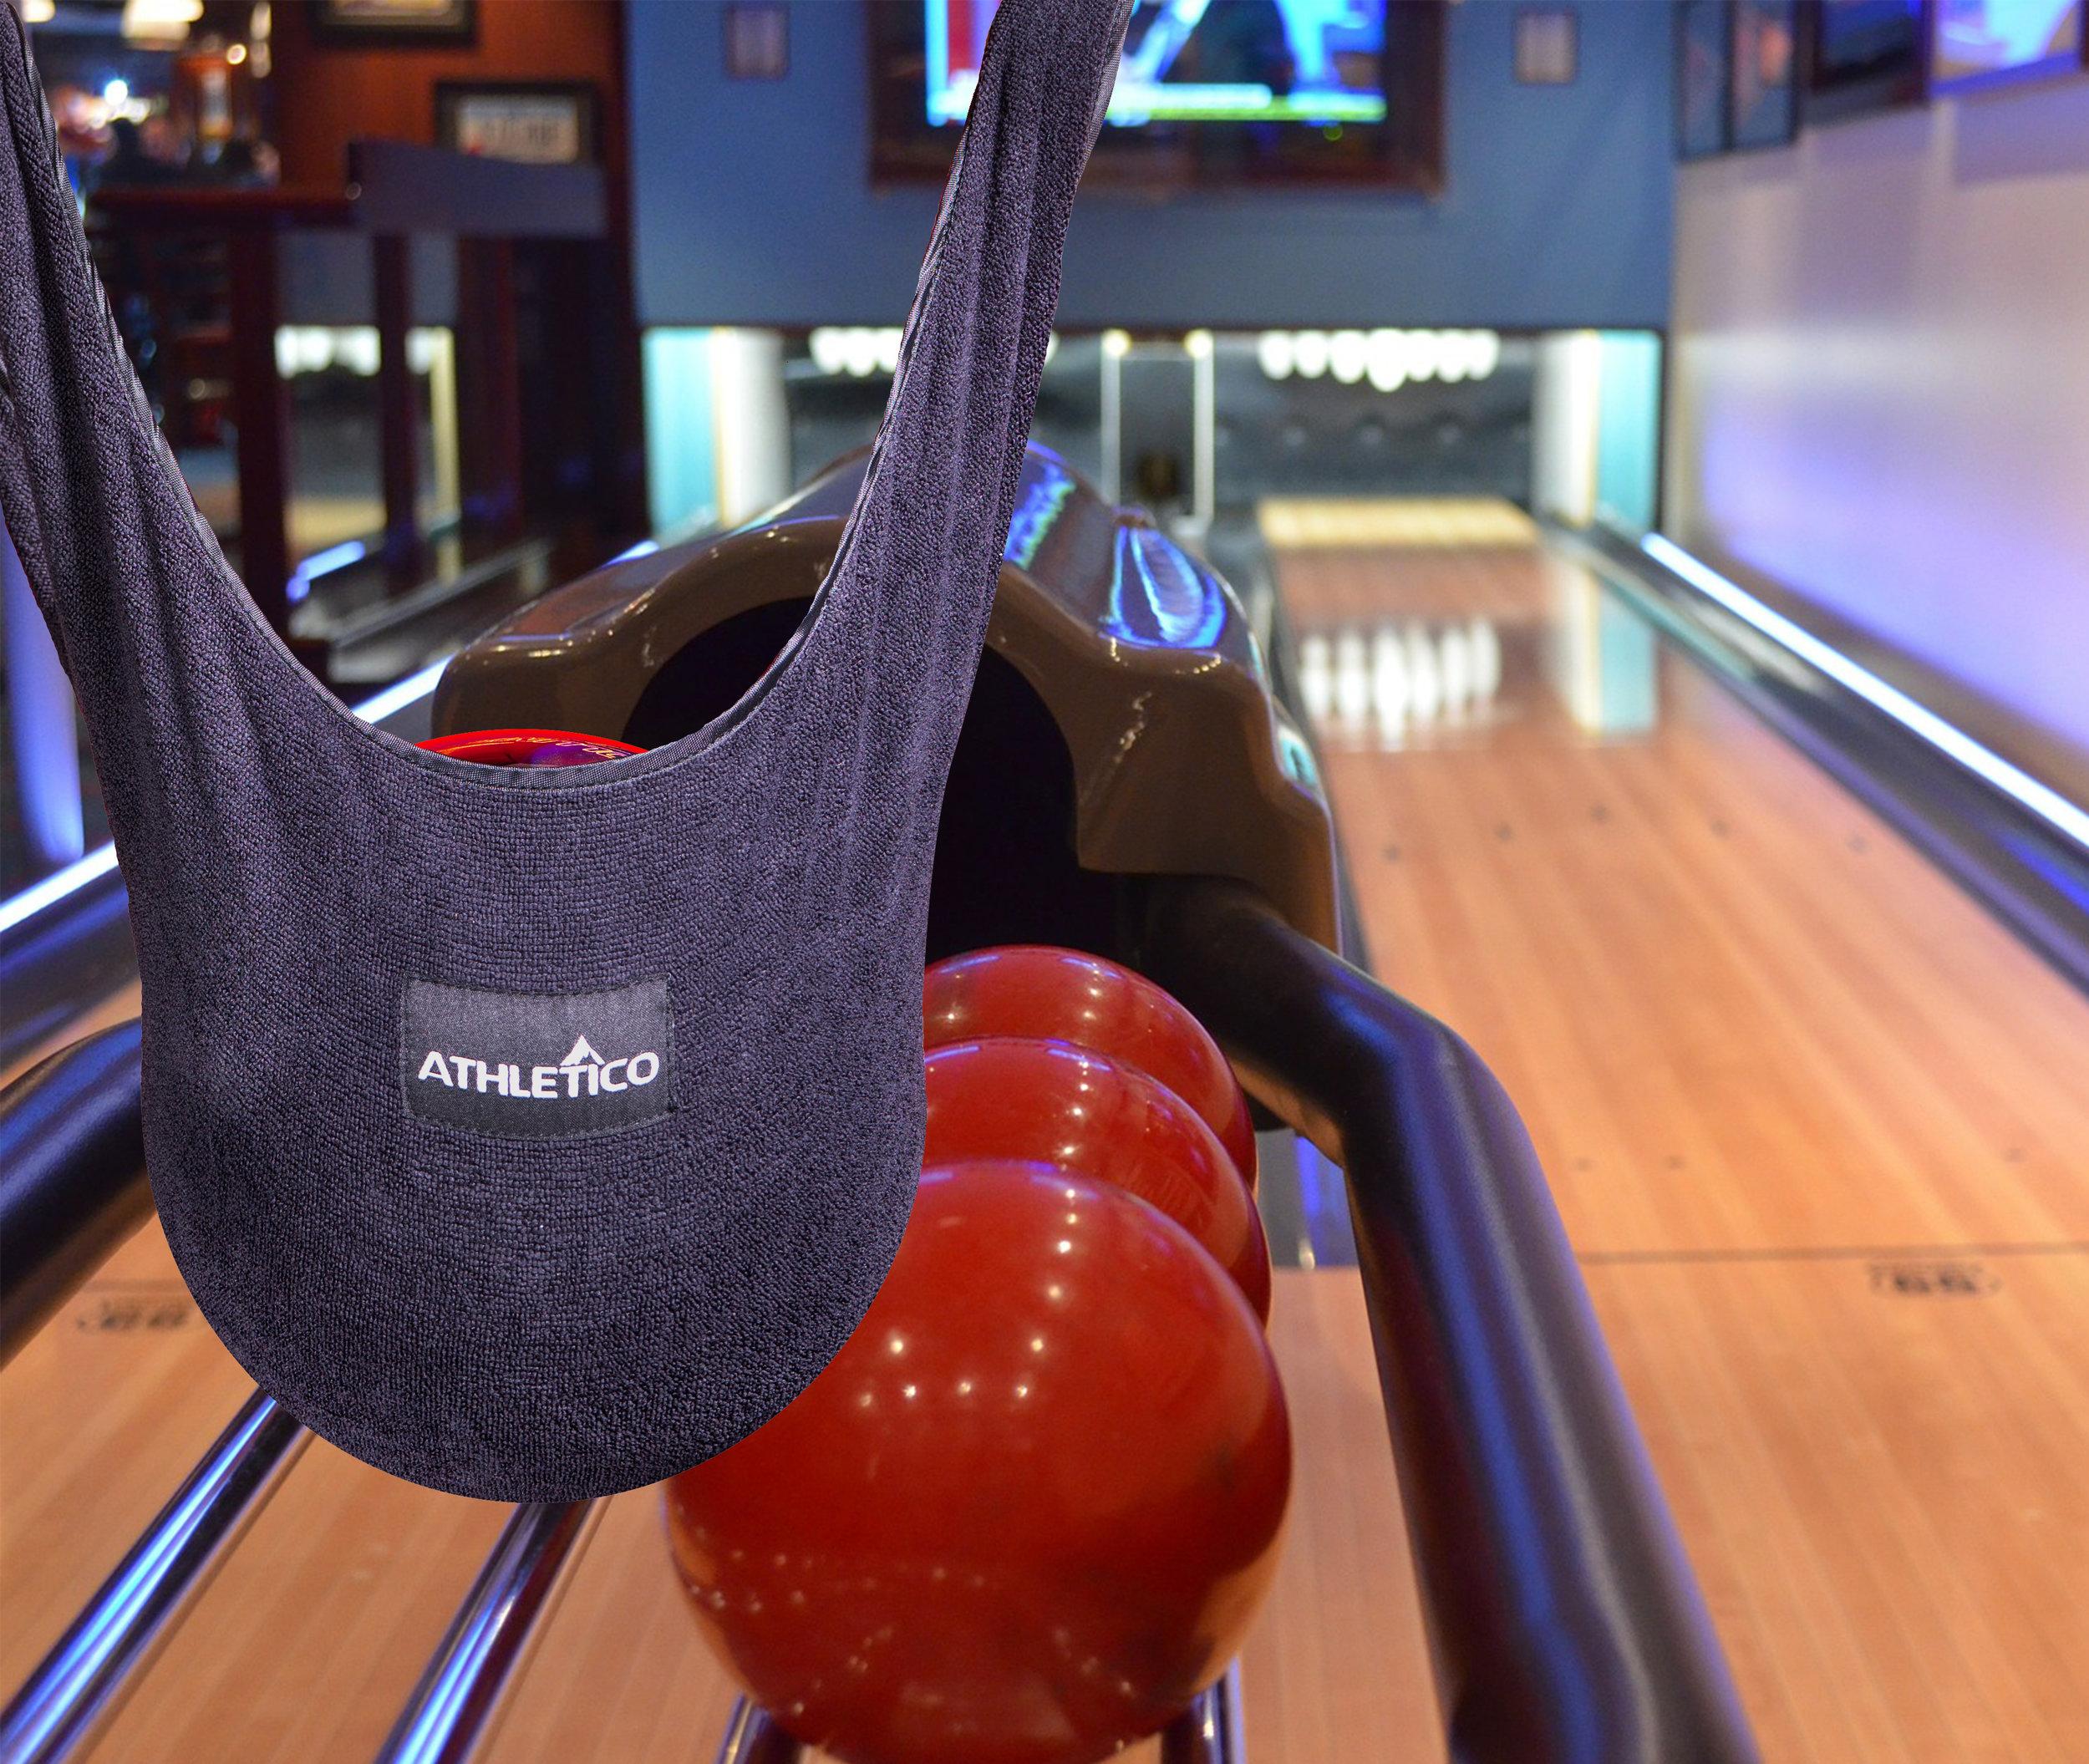 Athletico-Bowling-See-Saw-2.2.jpg